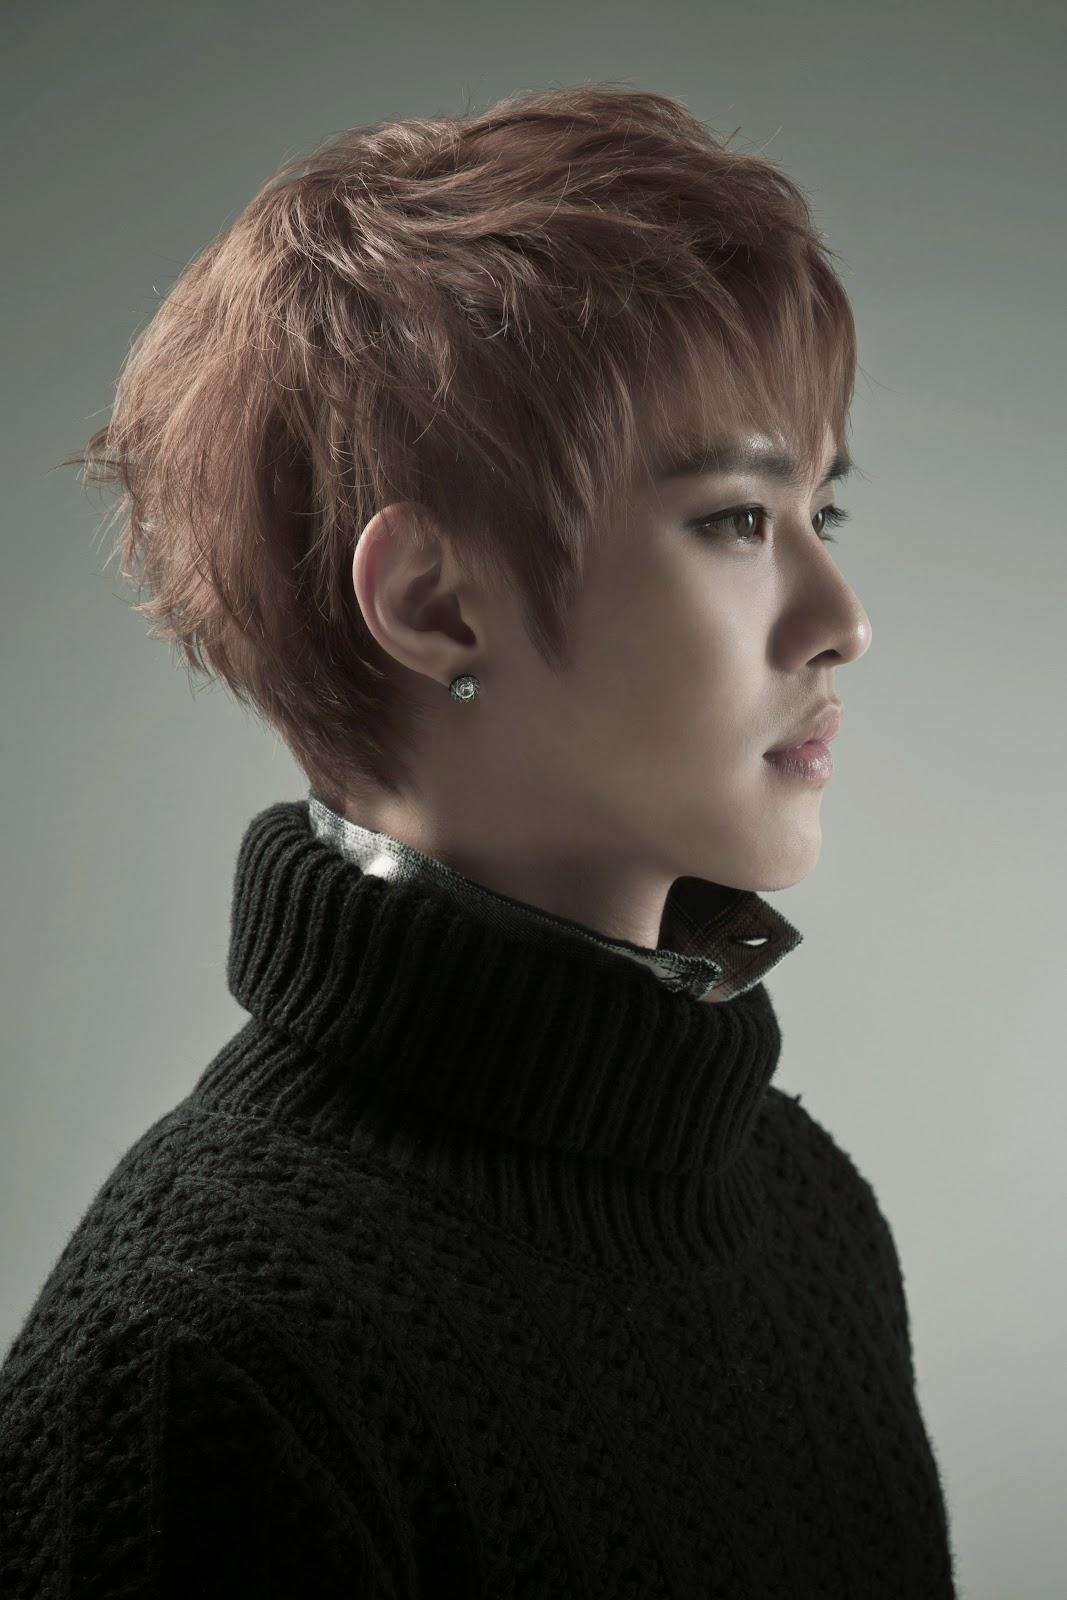 MBLAQ Winter Seungho